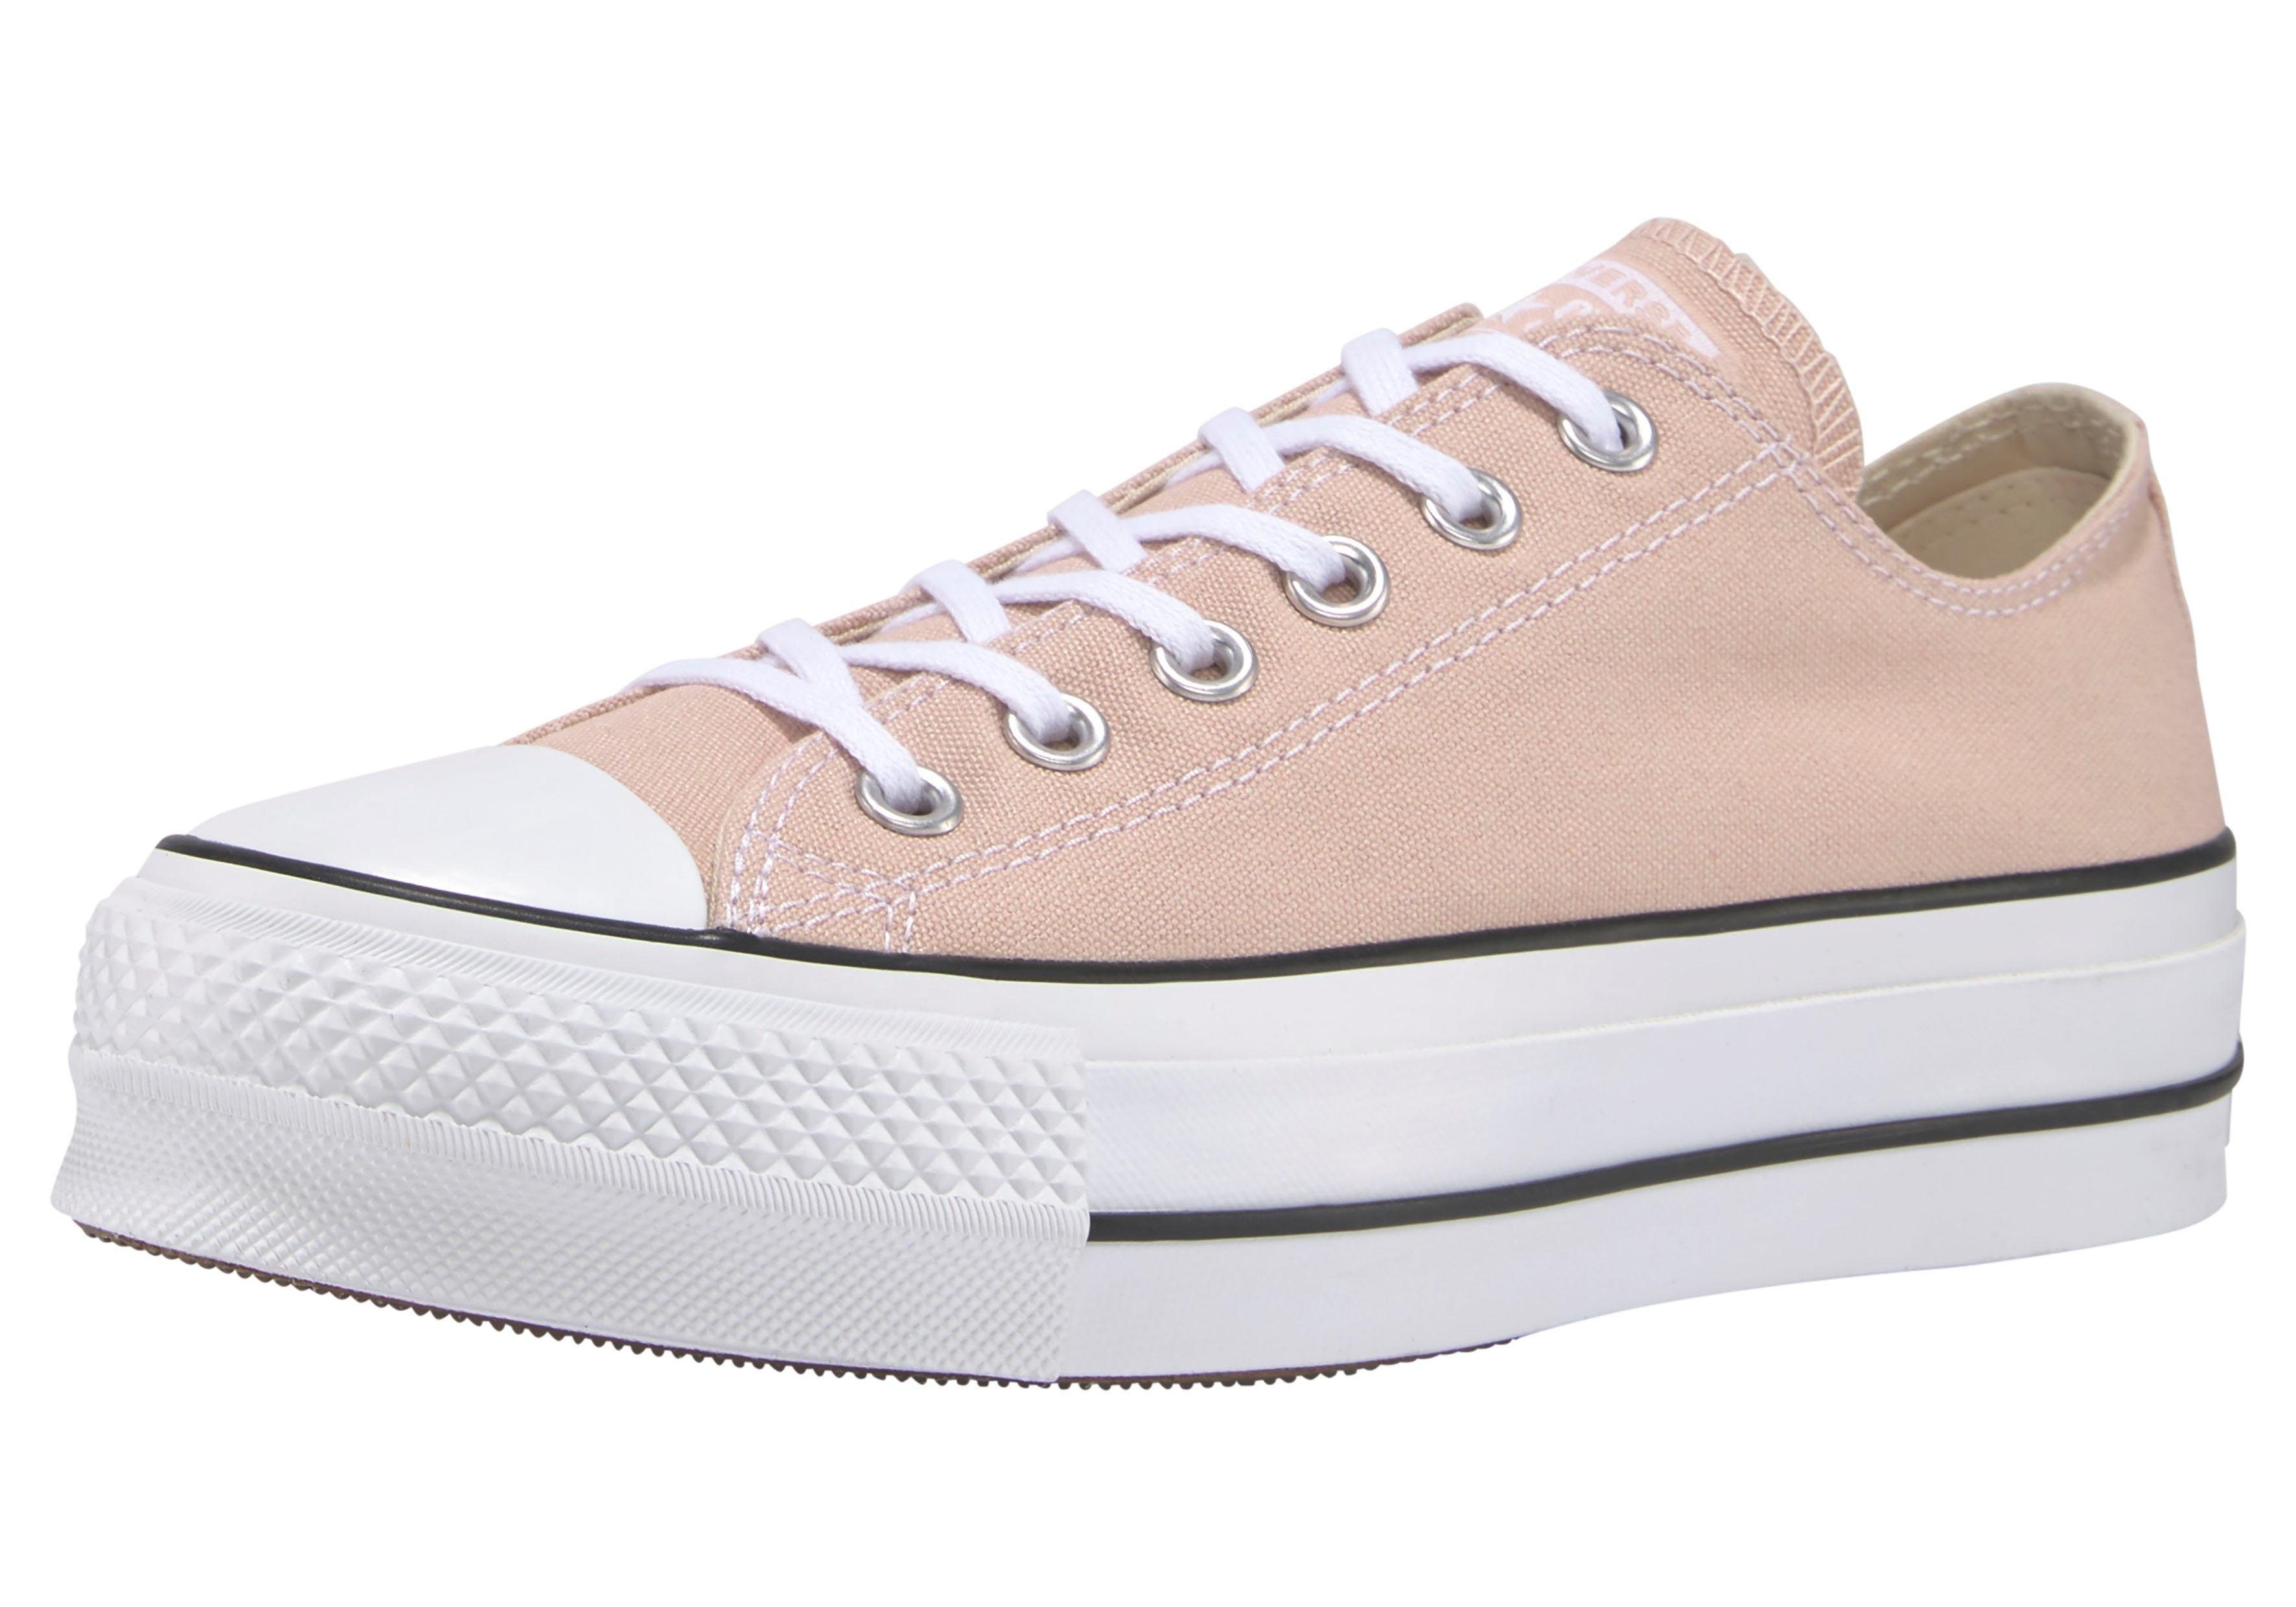 Converse »Chuck Taylor All Star Lift Ox« Plateausneaker online kaufen   OTTO